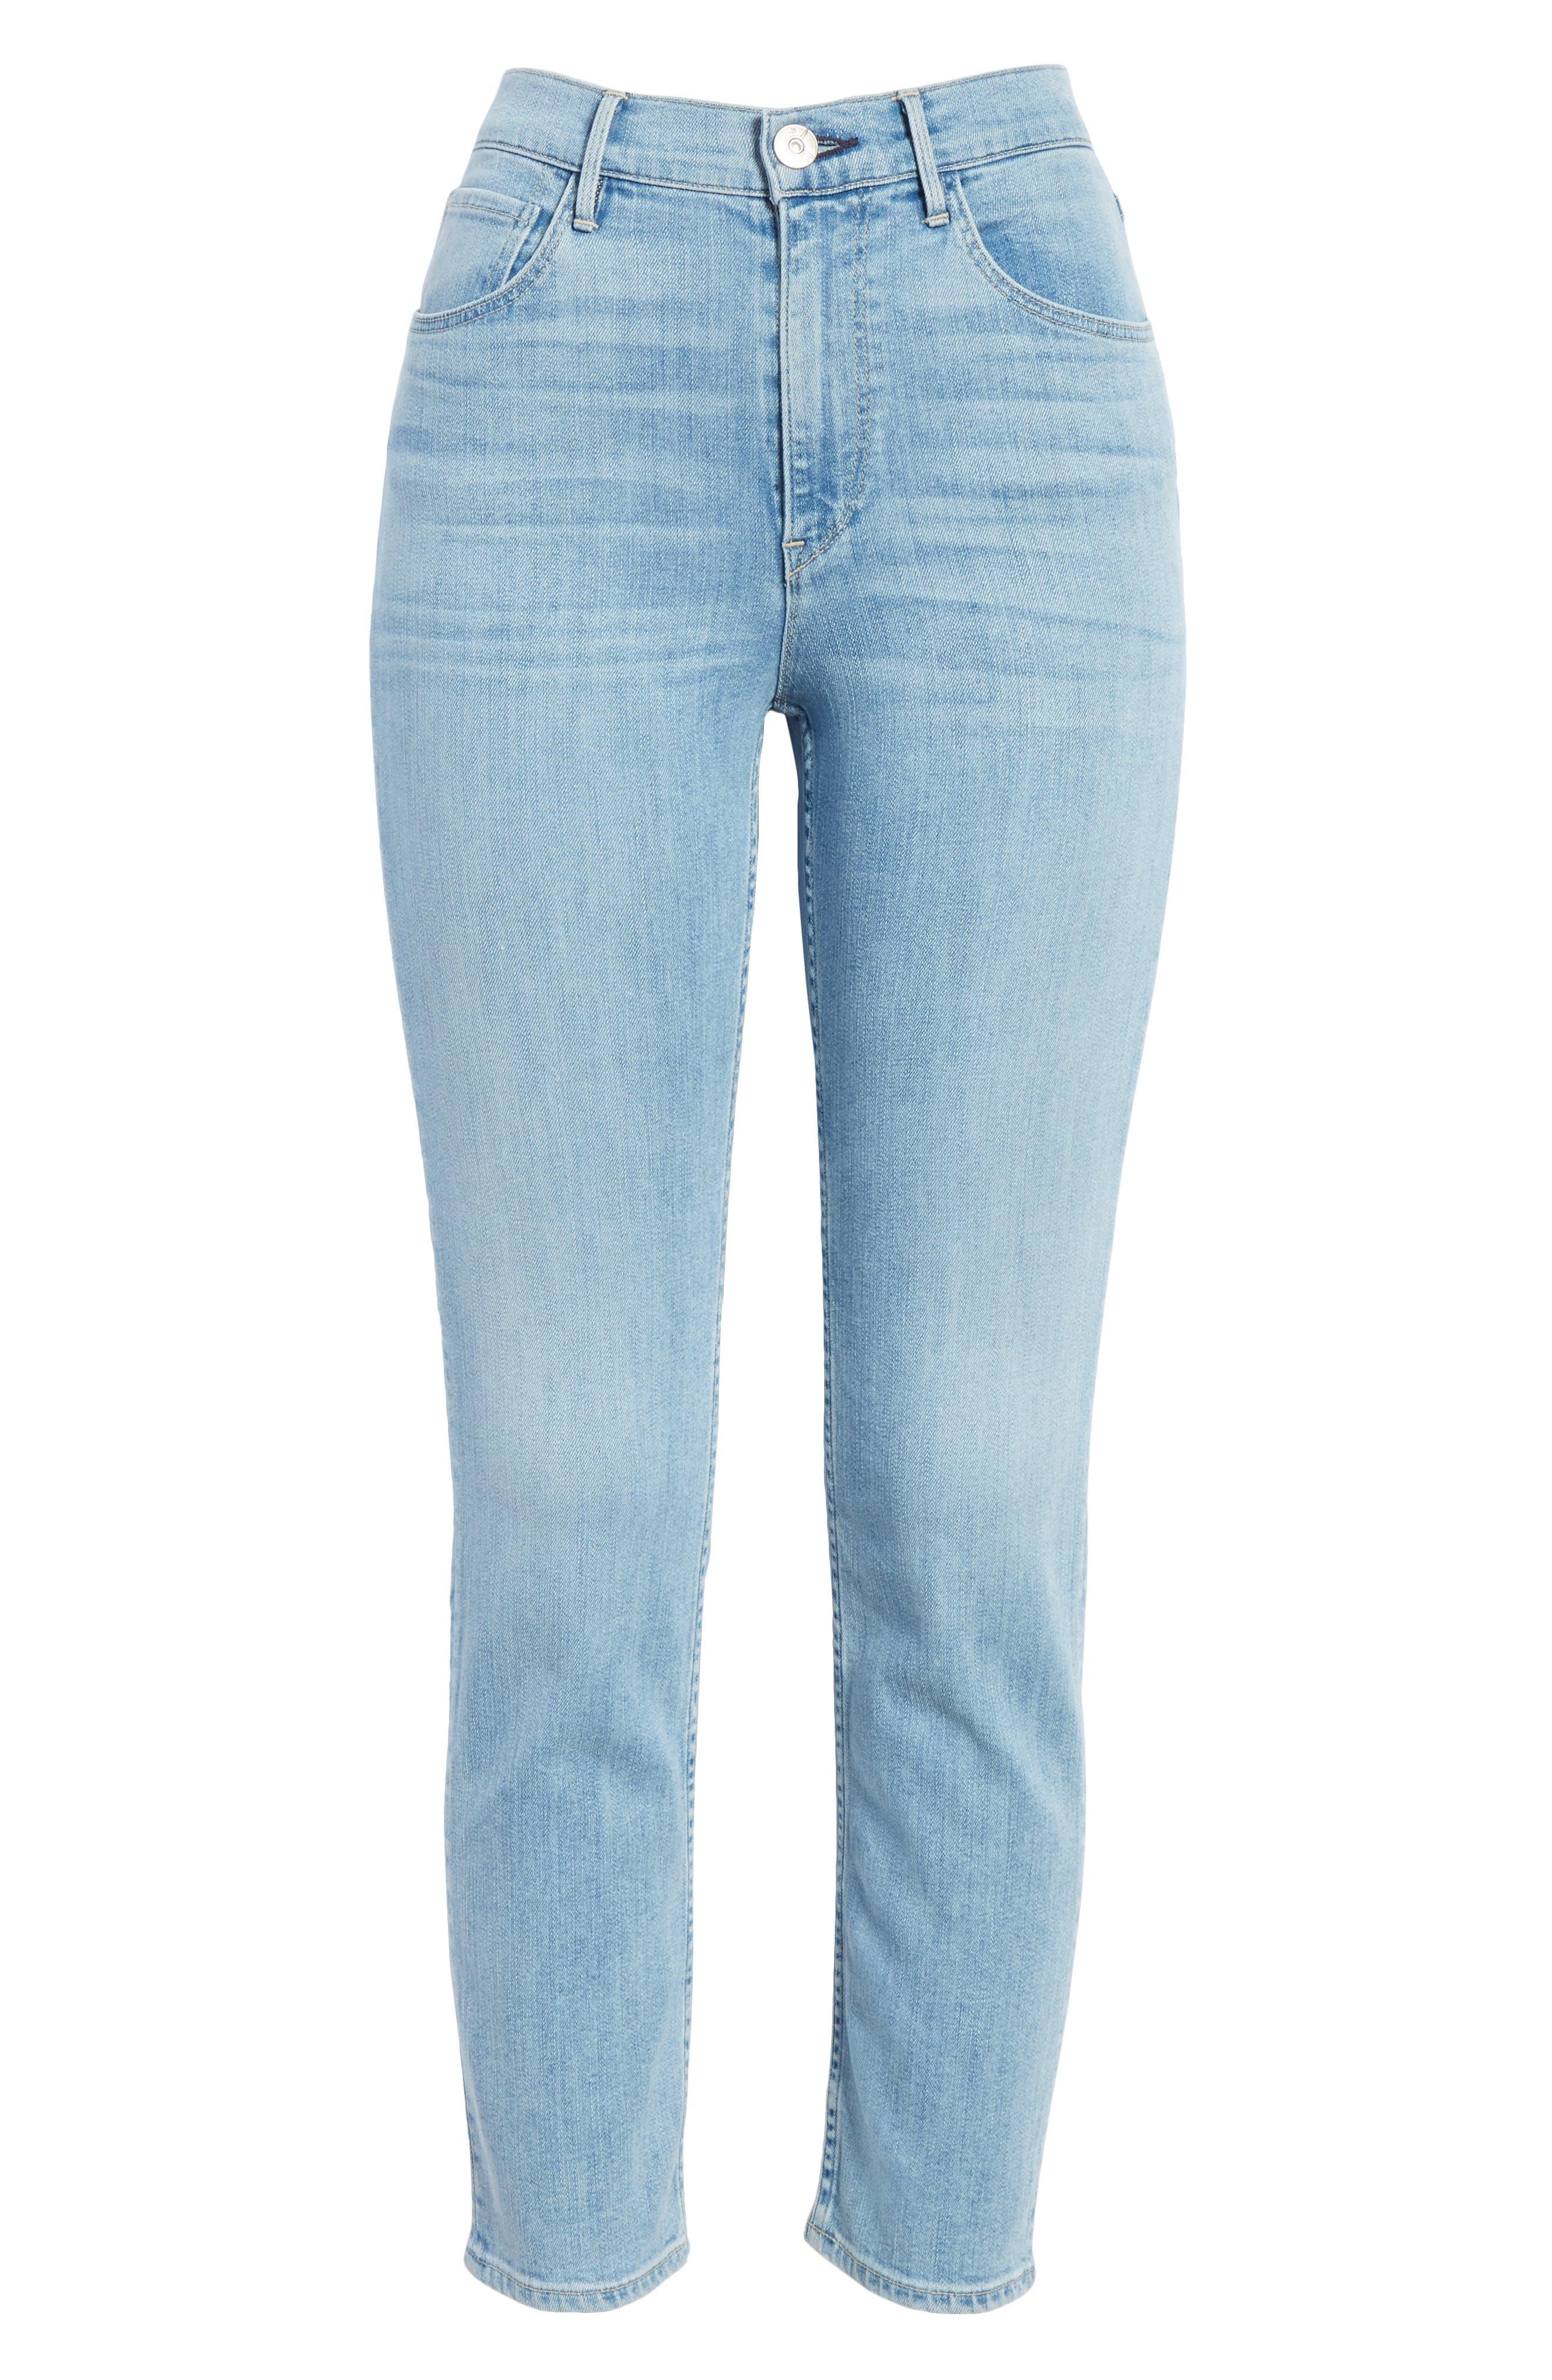 W4 Colette Crop Skinny Jeans,                             Alternate thumbnail 7, color,                             CARLO